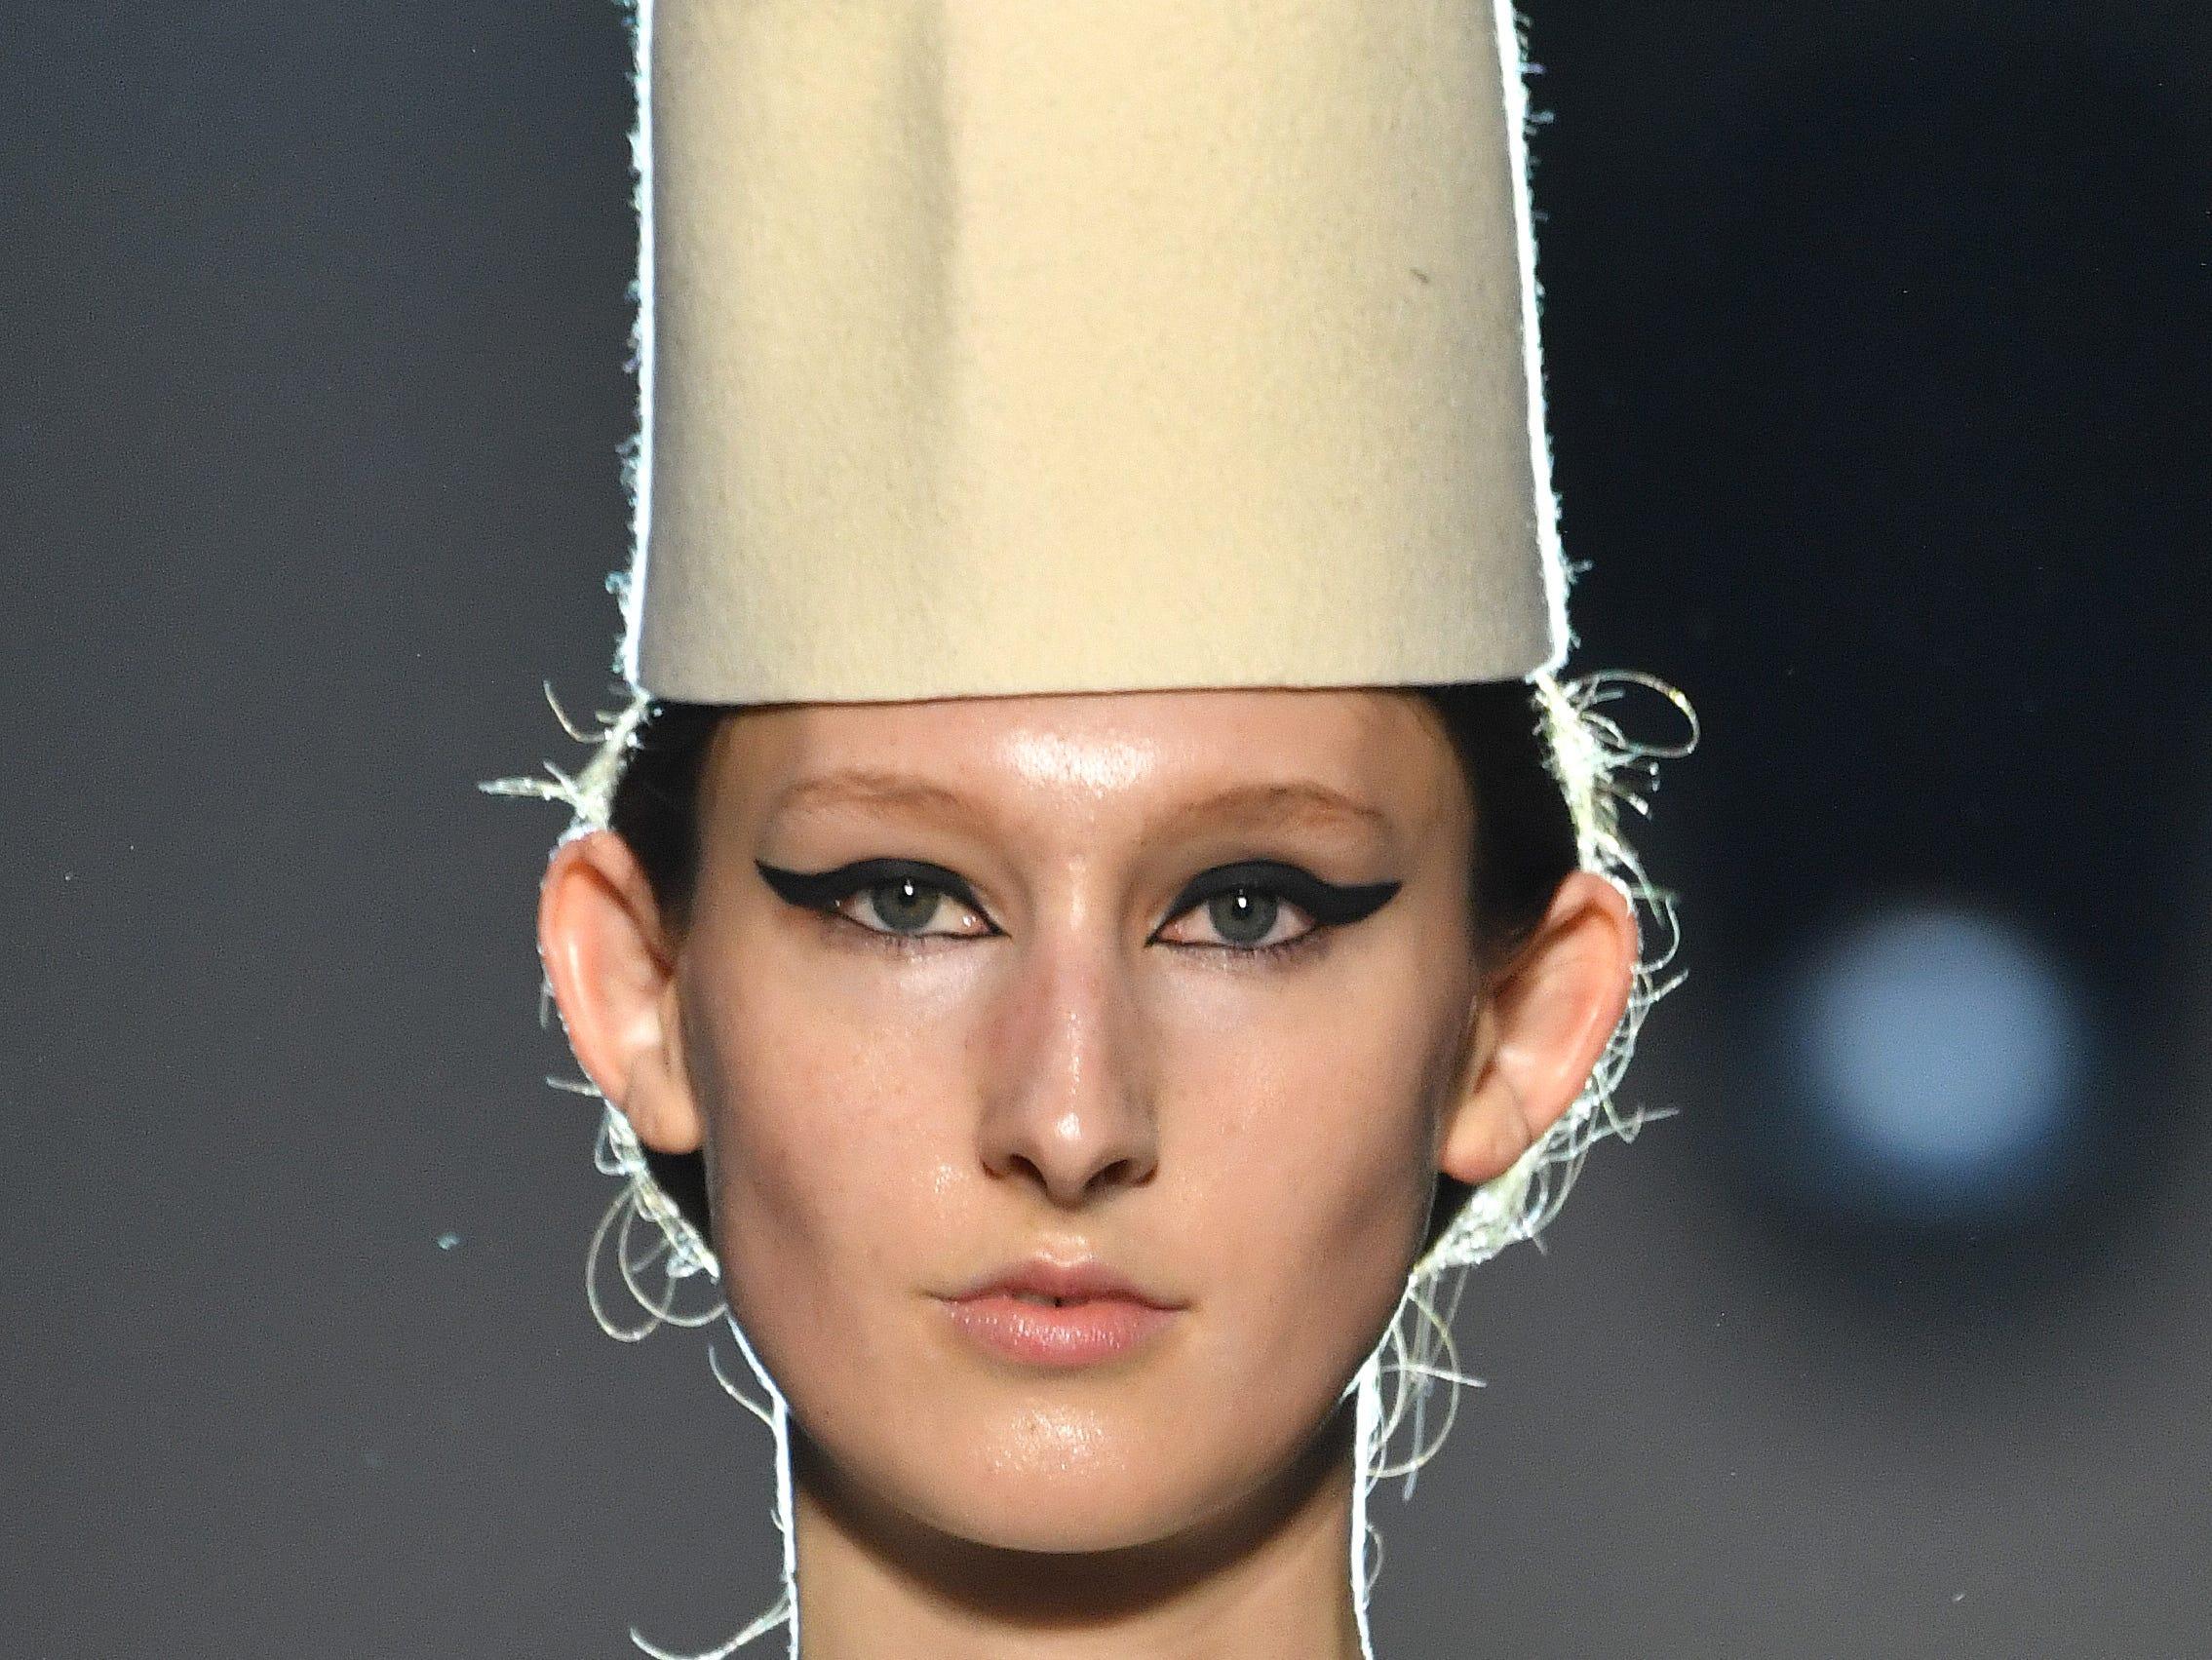 A model walks the runway during the Giambattista Valli Spring Summer 2019 show as part of Paris Fashion Week on Monday, Jan. 21, 2019.